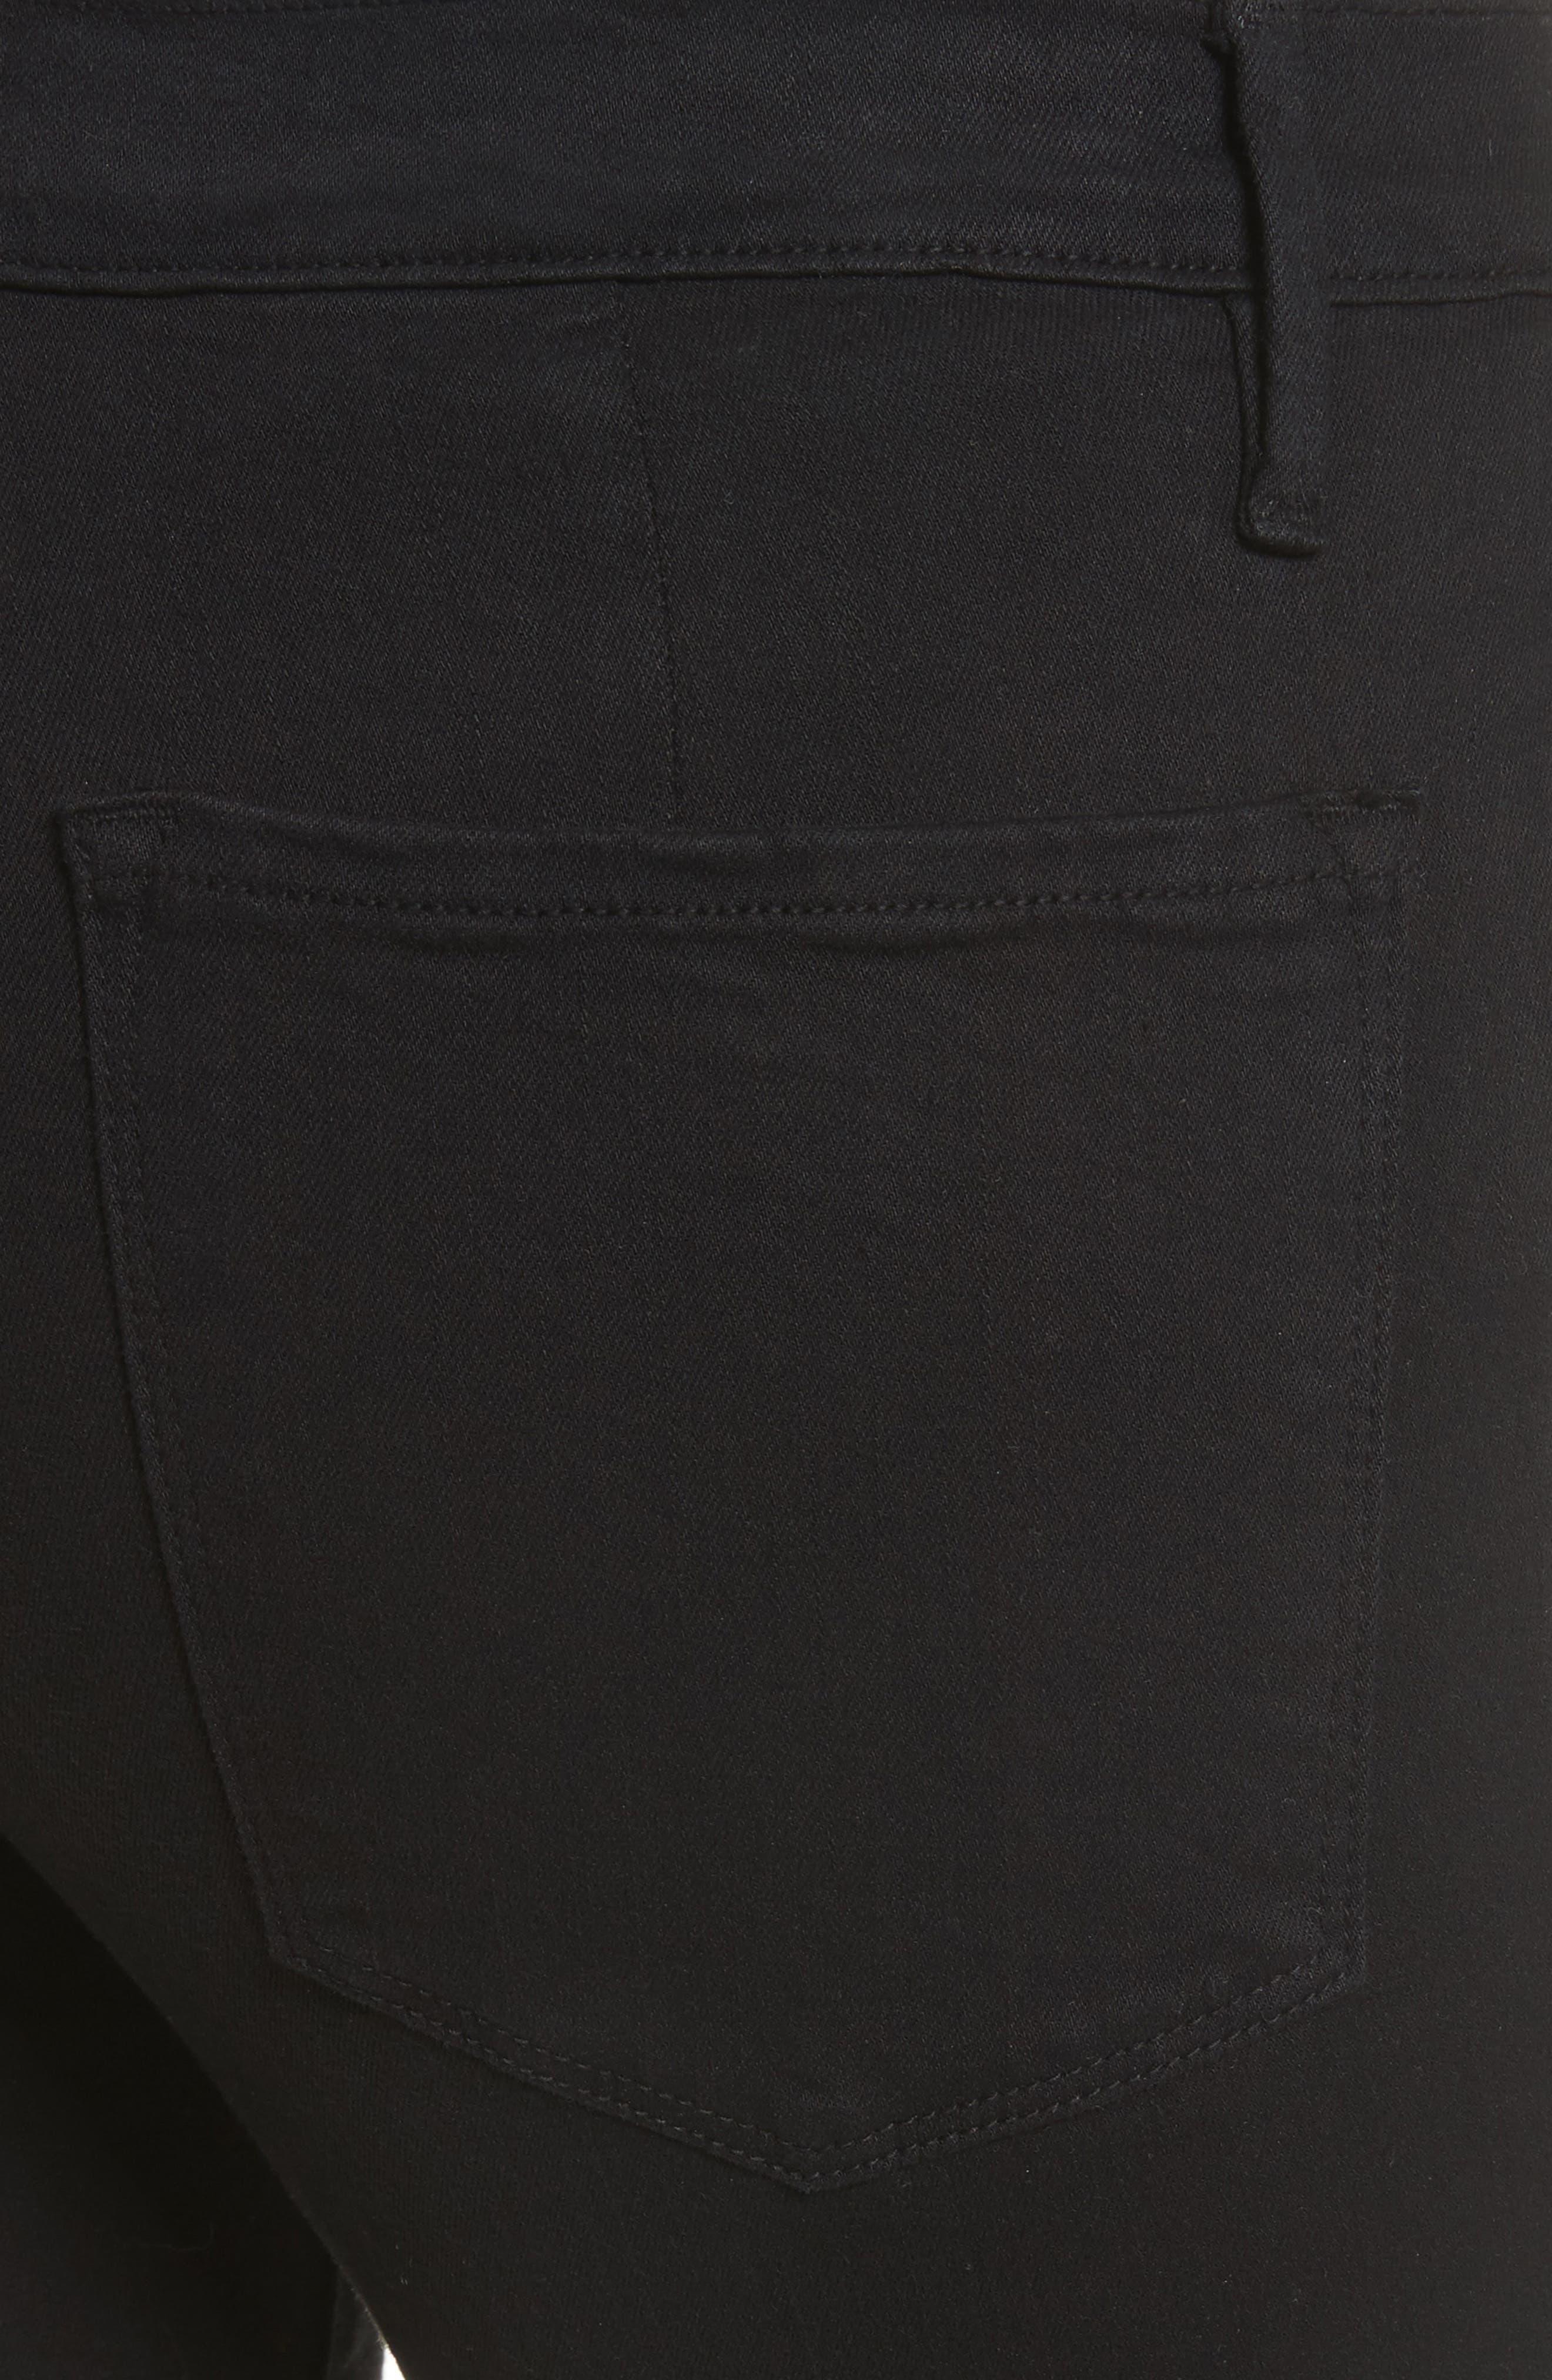 Le Skinny de Jeanne Flounce Skinny Jeans,                             Alternate thumbnail 5, color,                             Film Noir